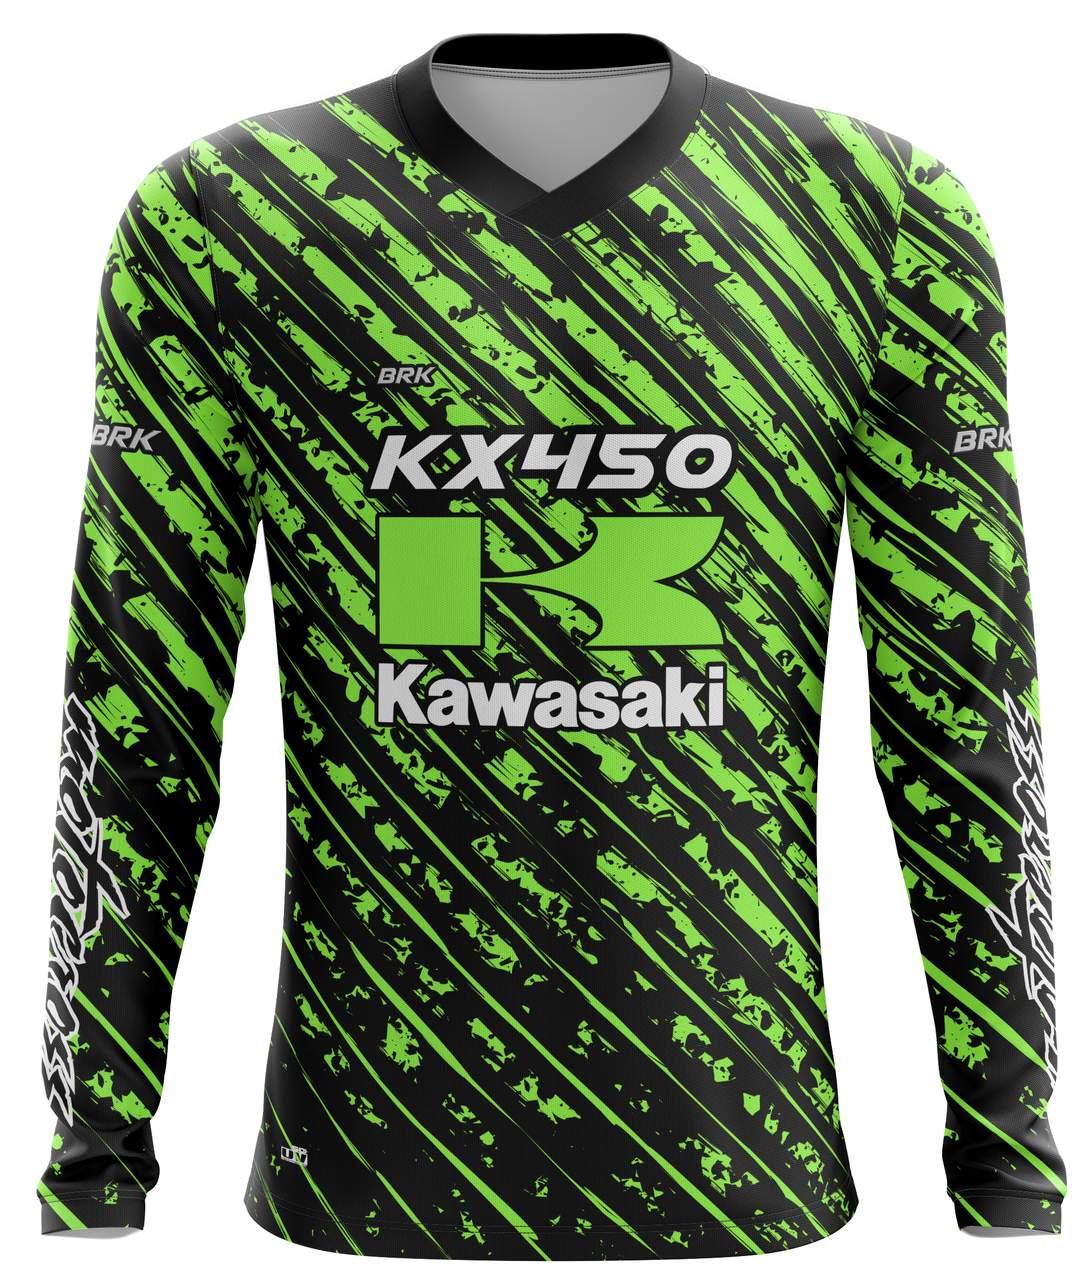 Camiseta Brk Motocross Kawasaki KX 450 com FPU 50+